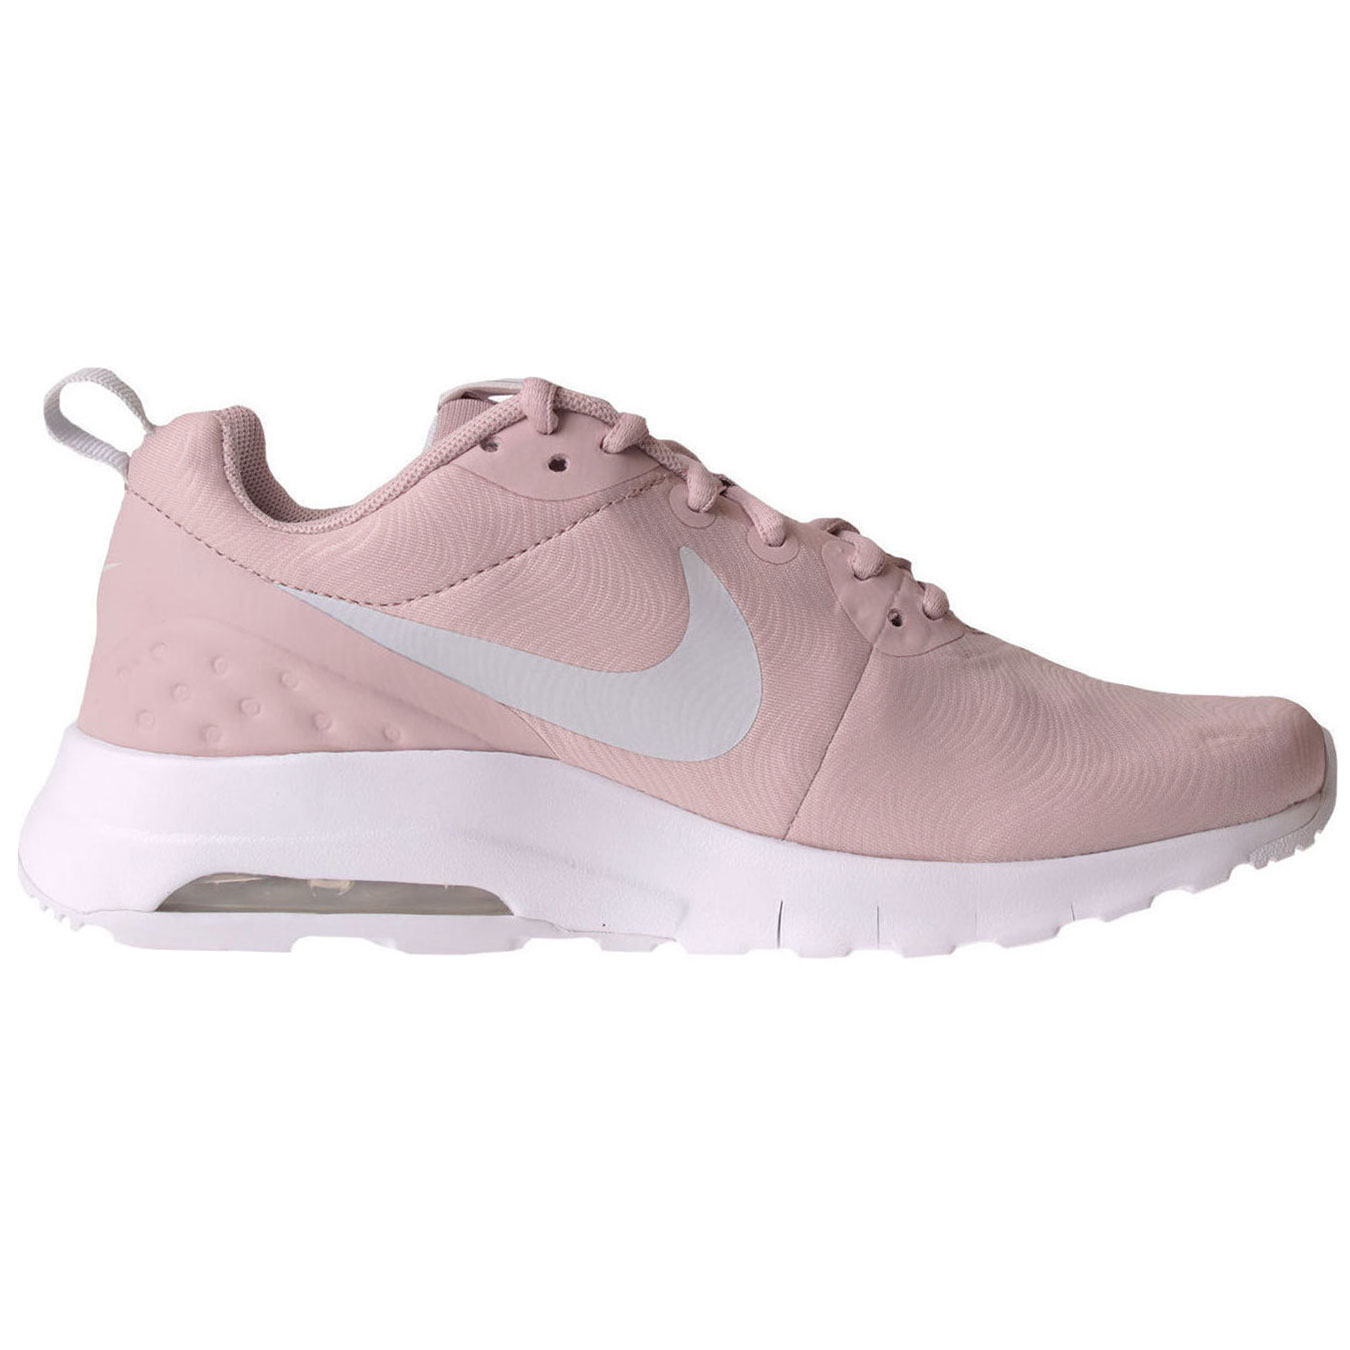 Nike WMNS Air Max Motion LW SE Damen Sneaker particle rose 844895 604